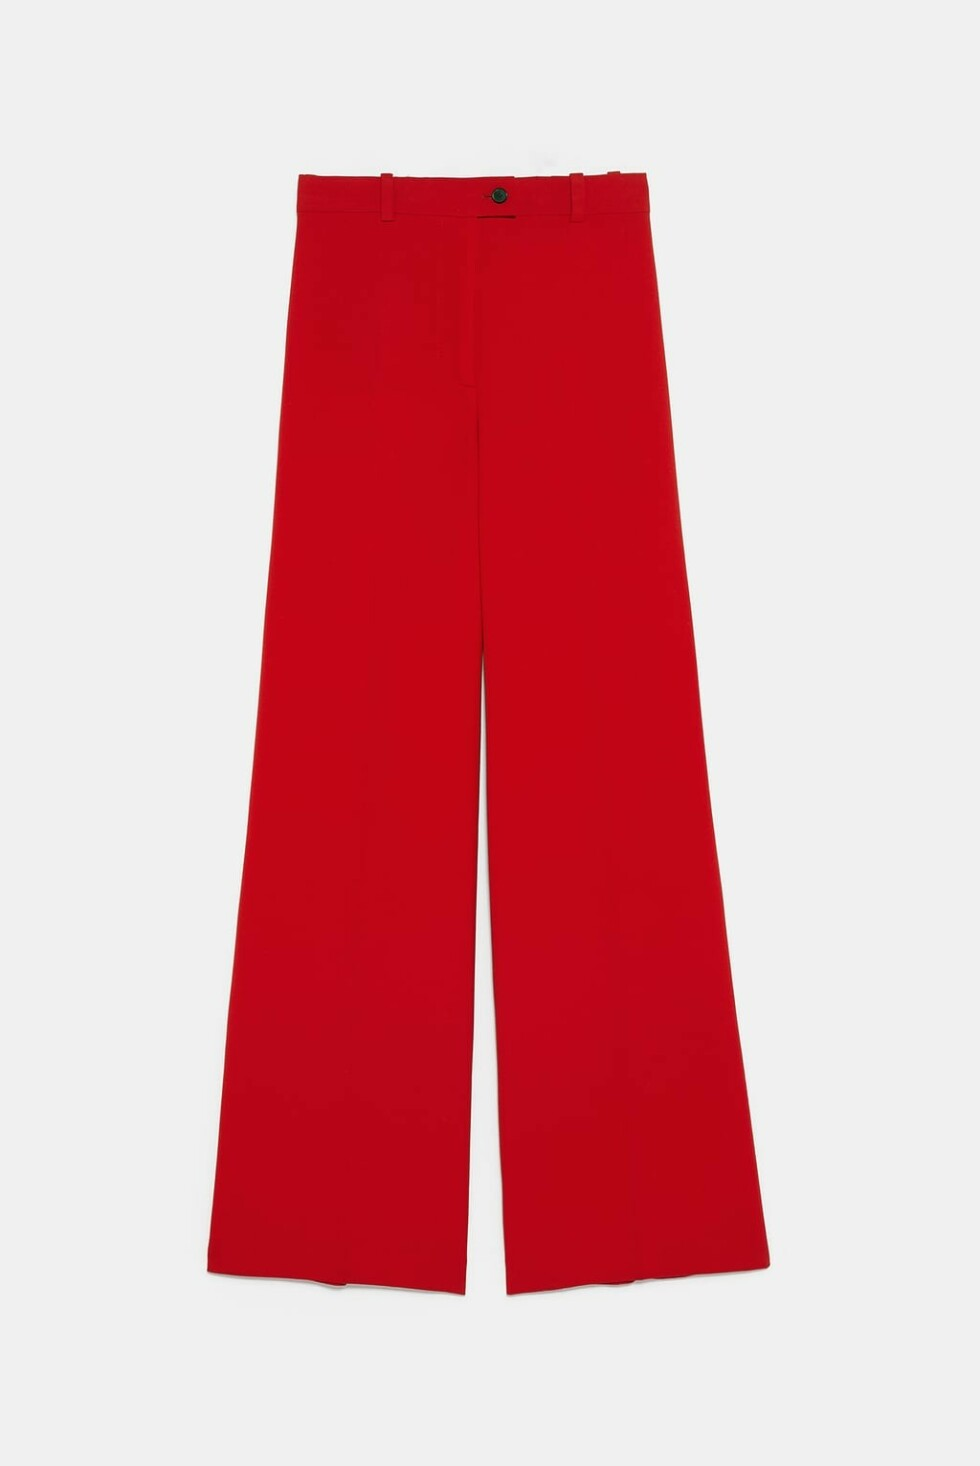 Bukse fra Zara |550,-| https://www.zara.com/no/no/rett-bukse-p02387703.html?v1=8679654&v2=1181443